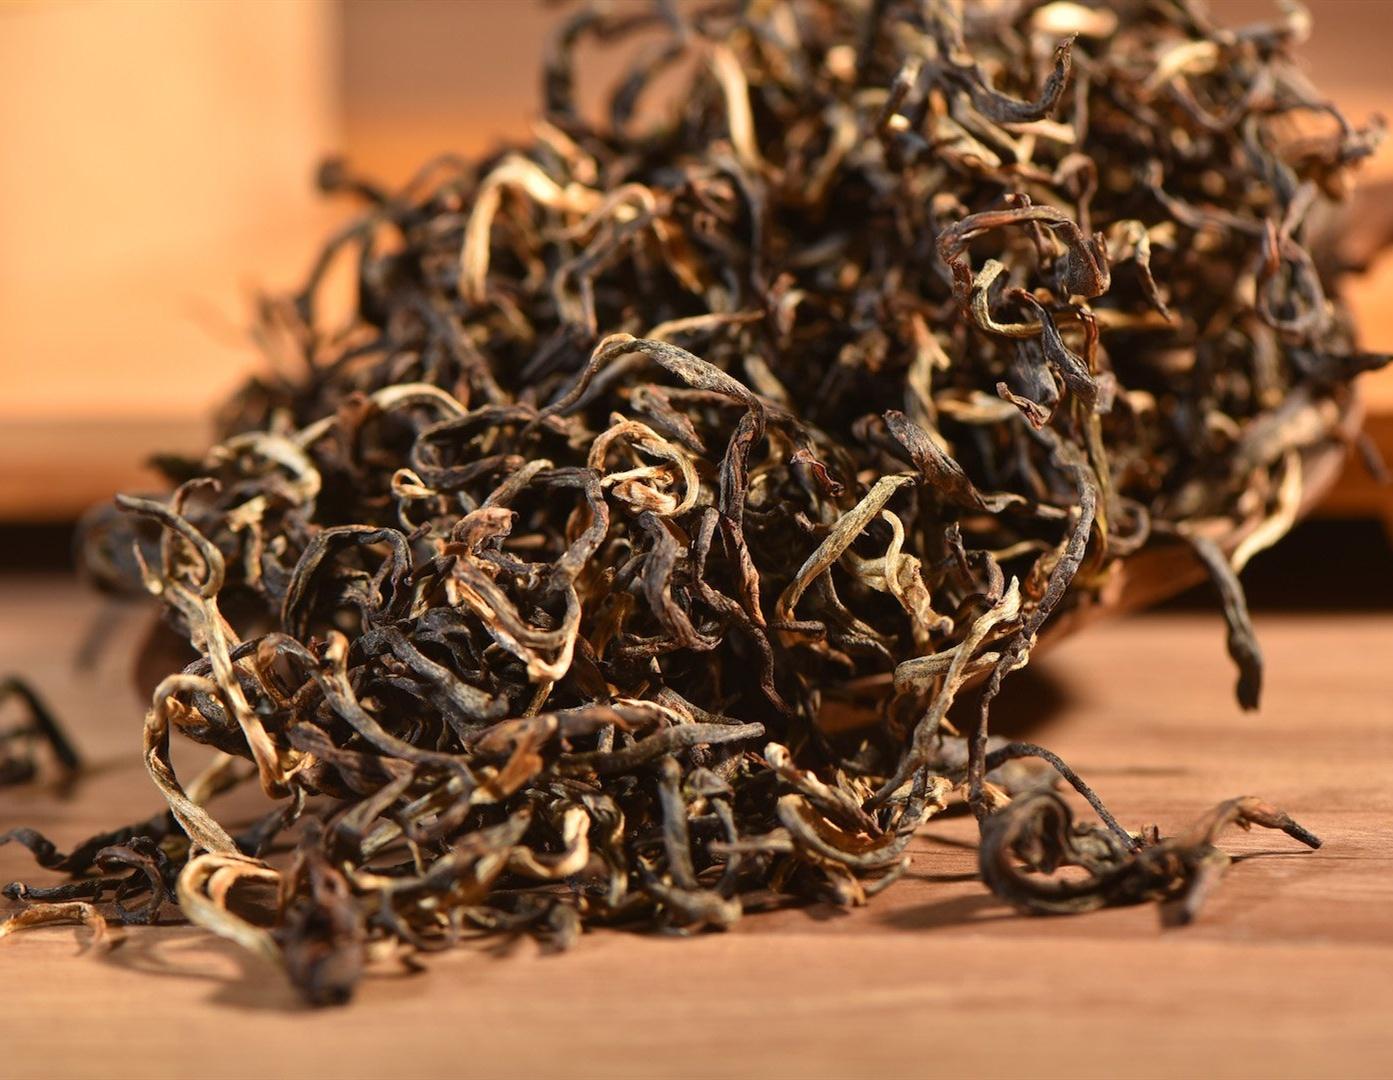 Wholesale yunnan yellow tea loose leaf highmountain tea - 4uTea | 4uTea.com